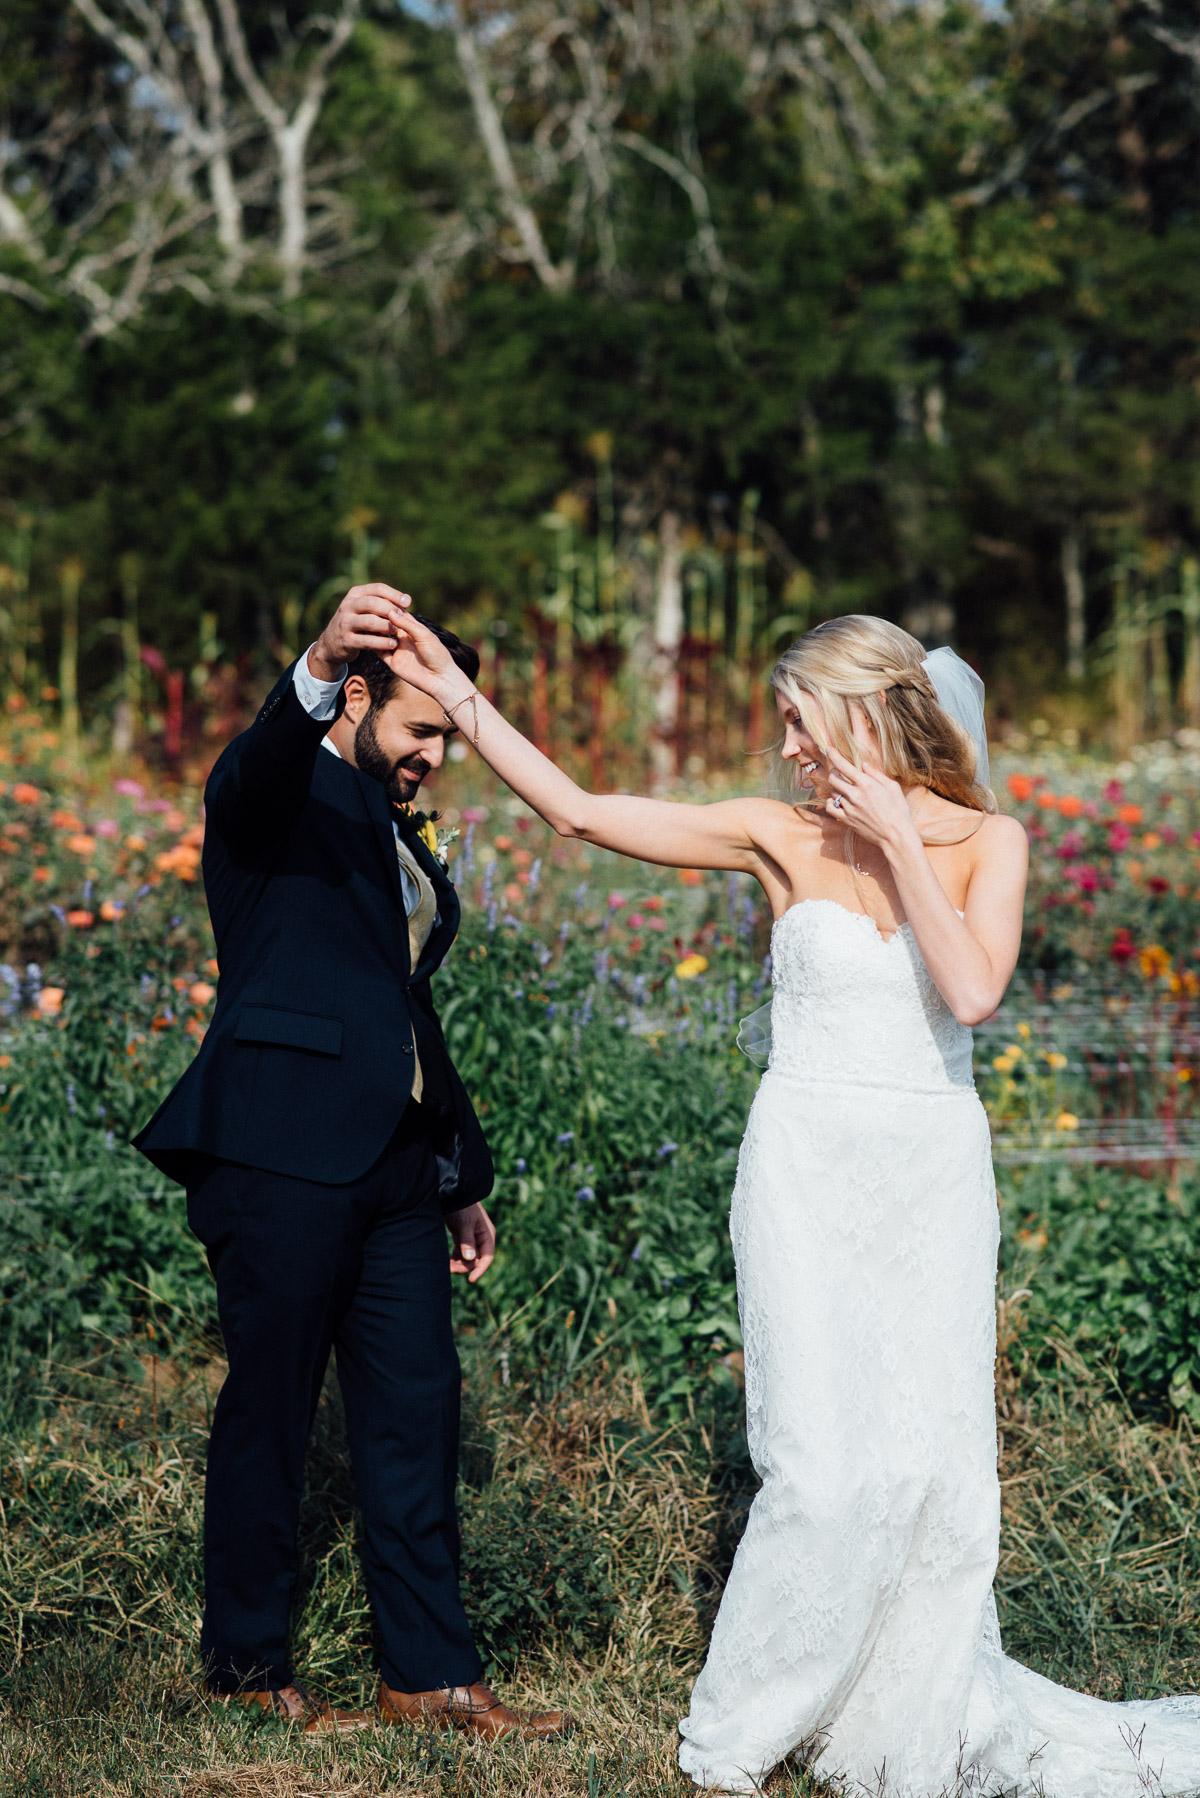 groom-twirling-bride Becky and Alex   Green Door Gourmet - Fall Nashville Wedding